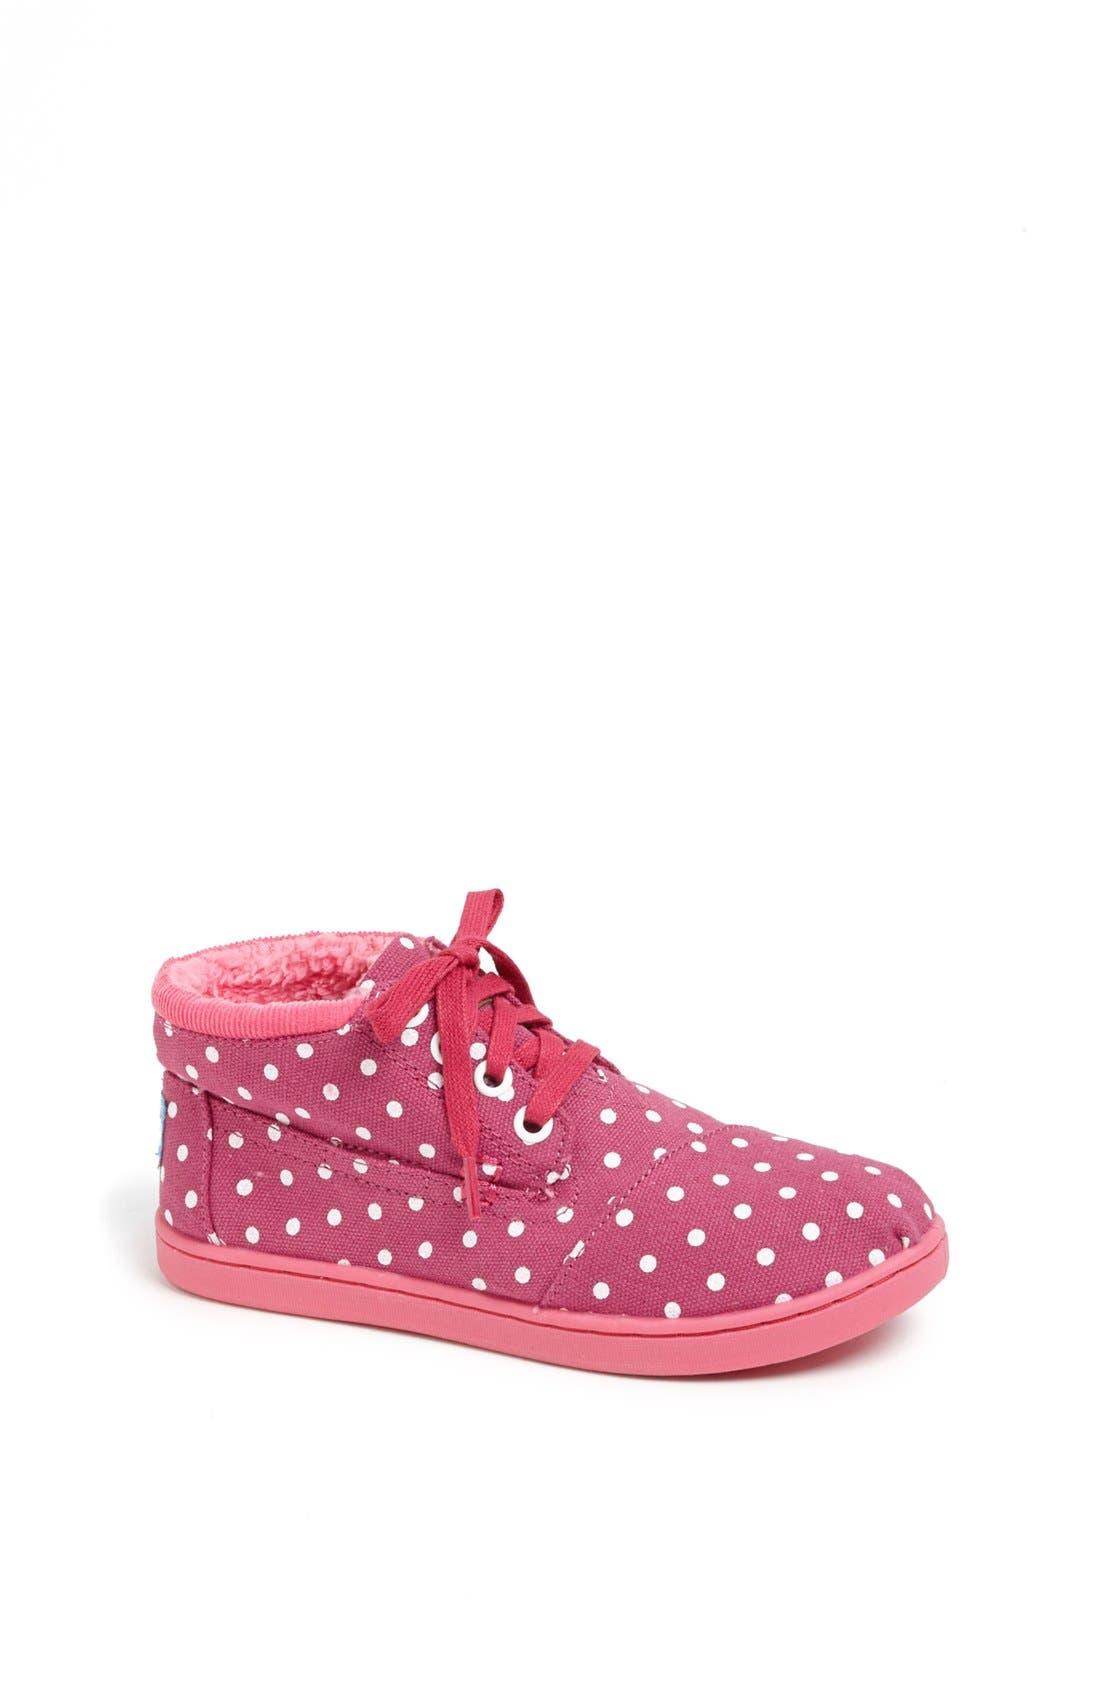 Main Image - TOMS 'Botas - Youth' High Top Sneaker (Toddler, Little Kid & Big Kid)